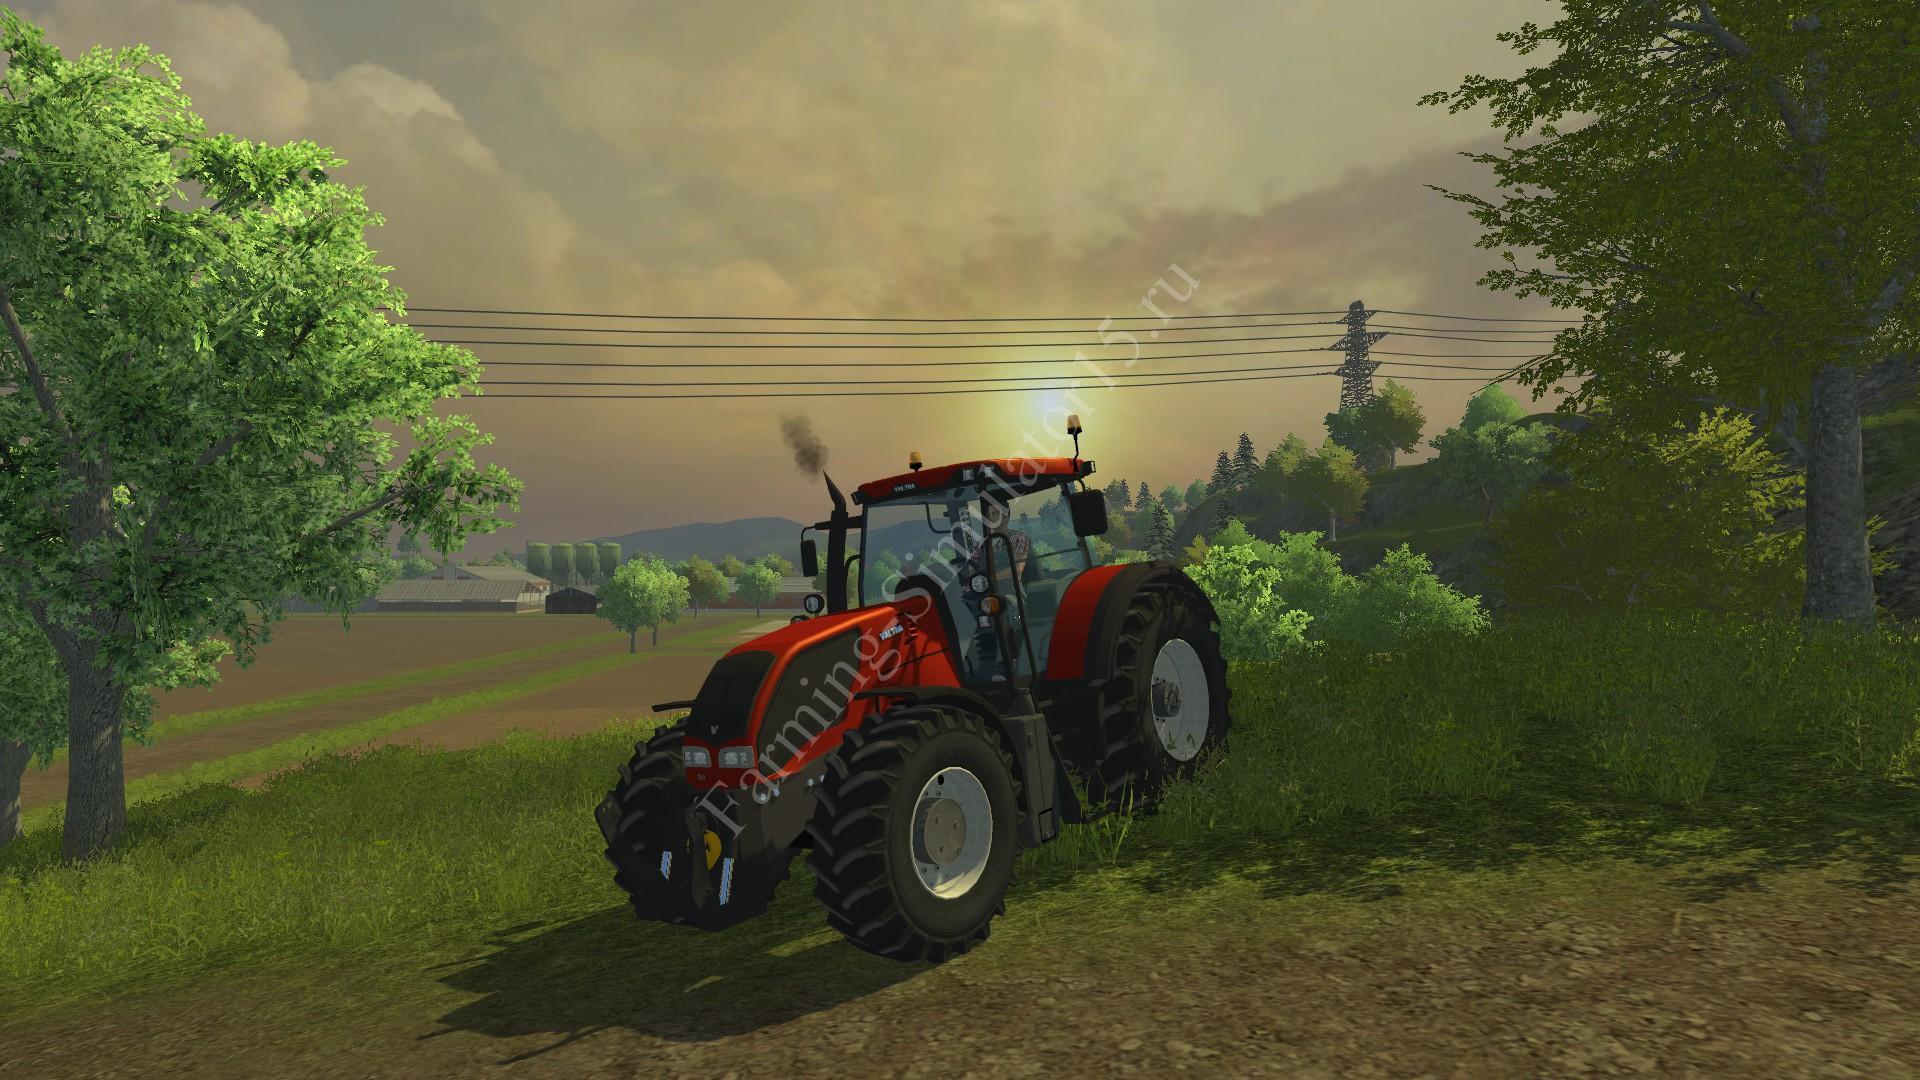 Мод трактора Valtra s 352 v 1.0 Farming Simulator 2013, Farming Simulator 13